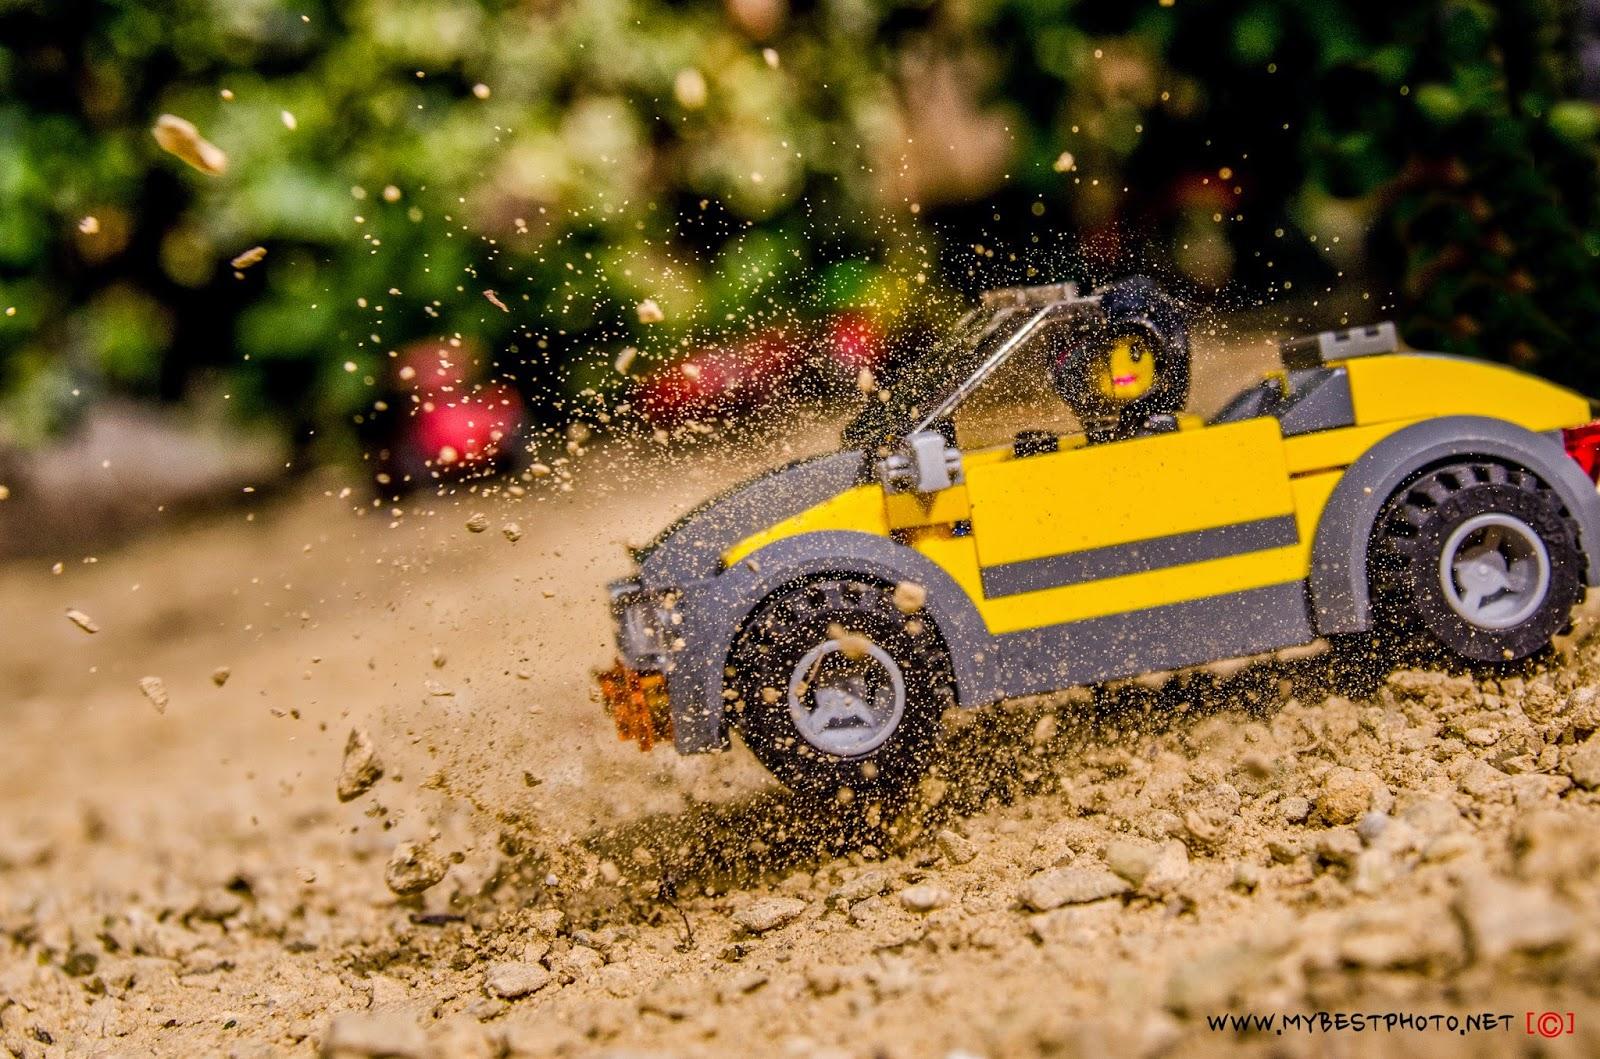 Lego Minifigures Series Lego Movie Wyldstyle - Wallpaper